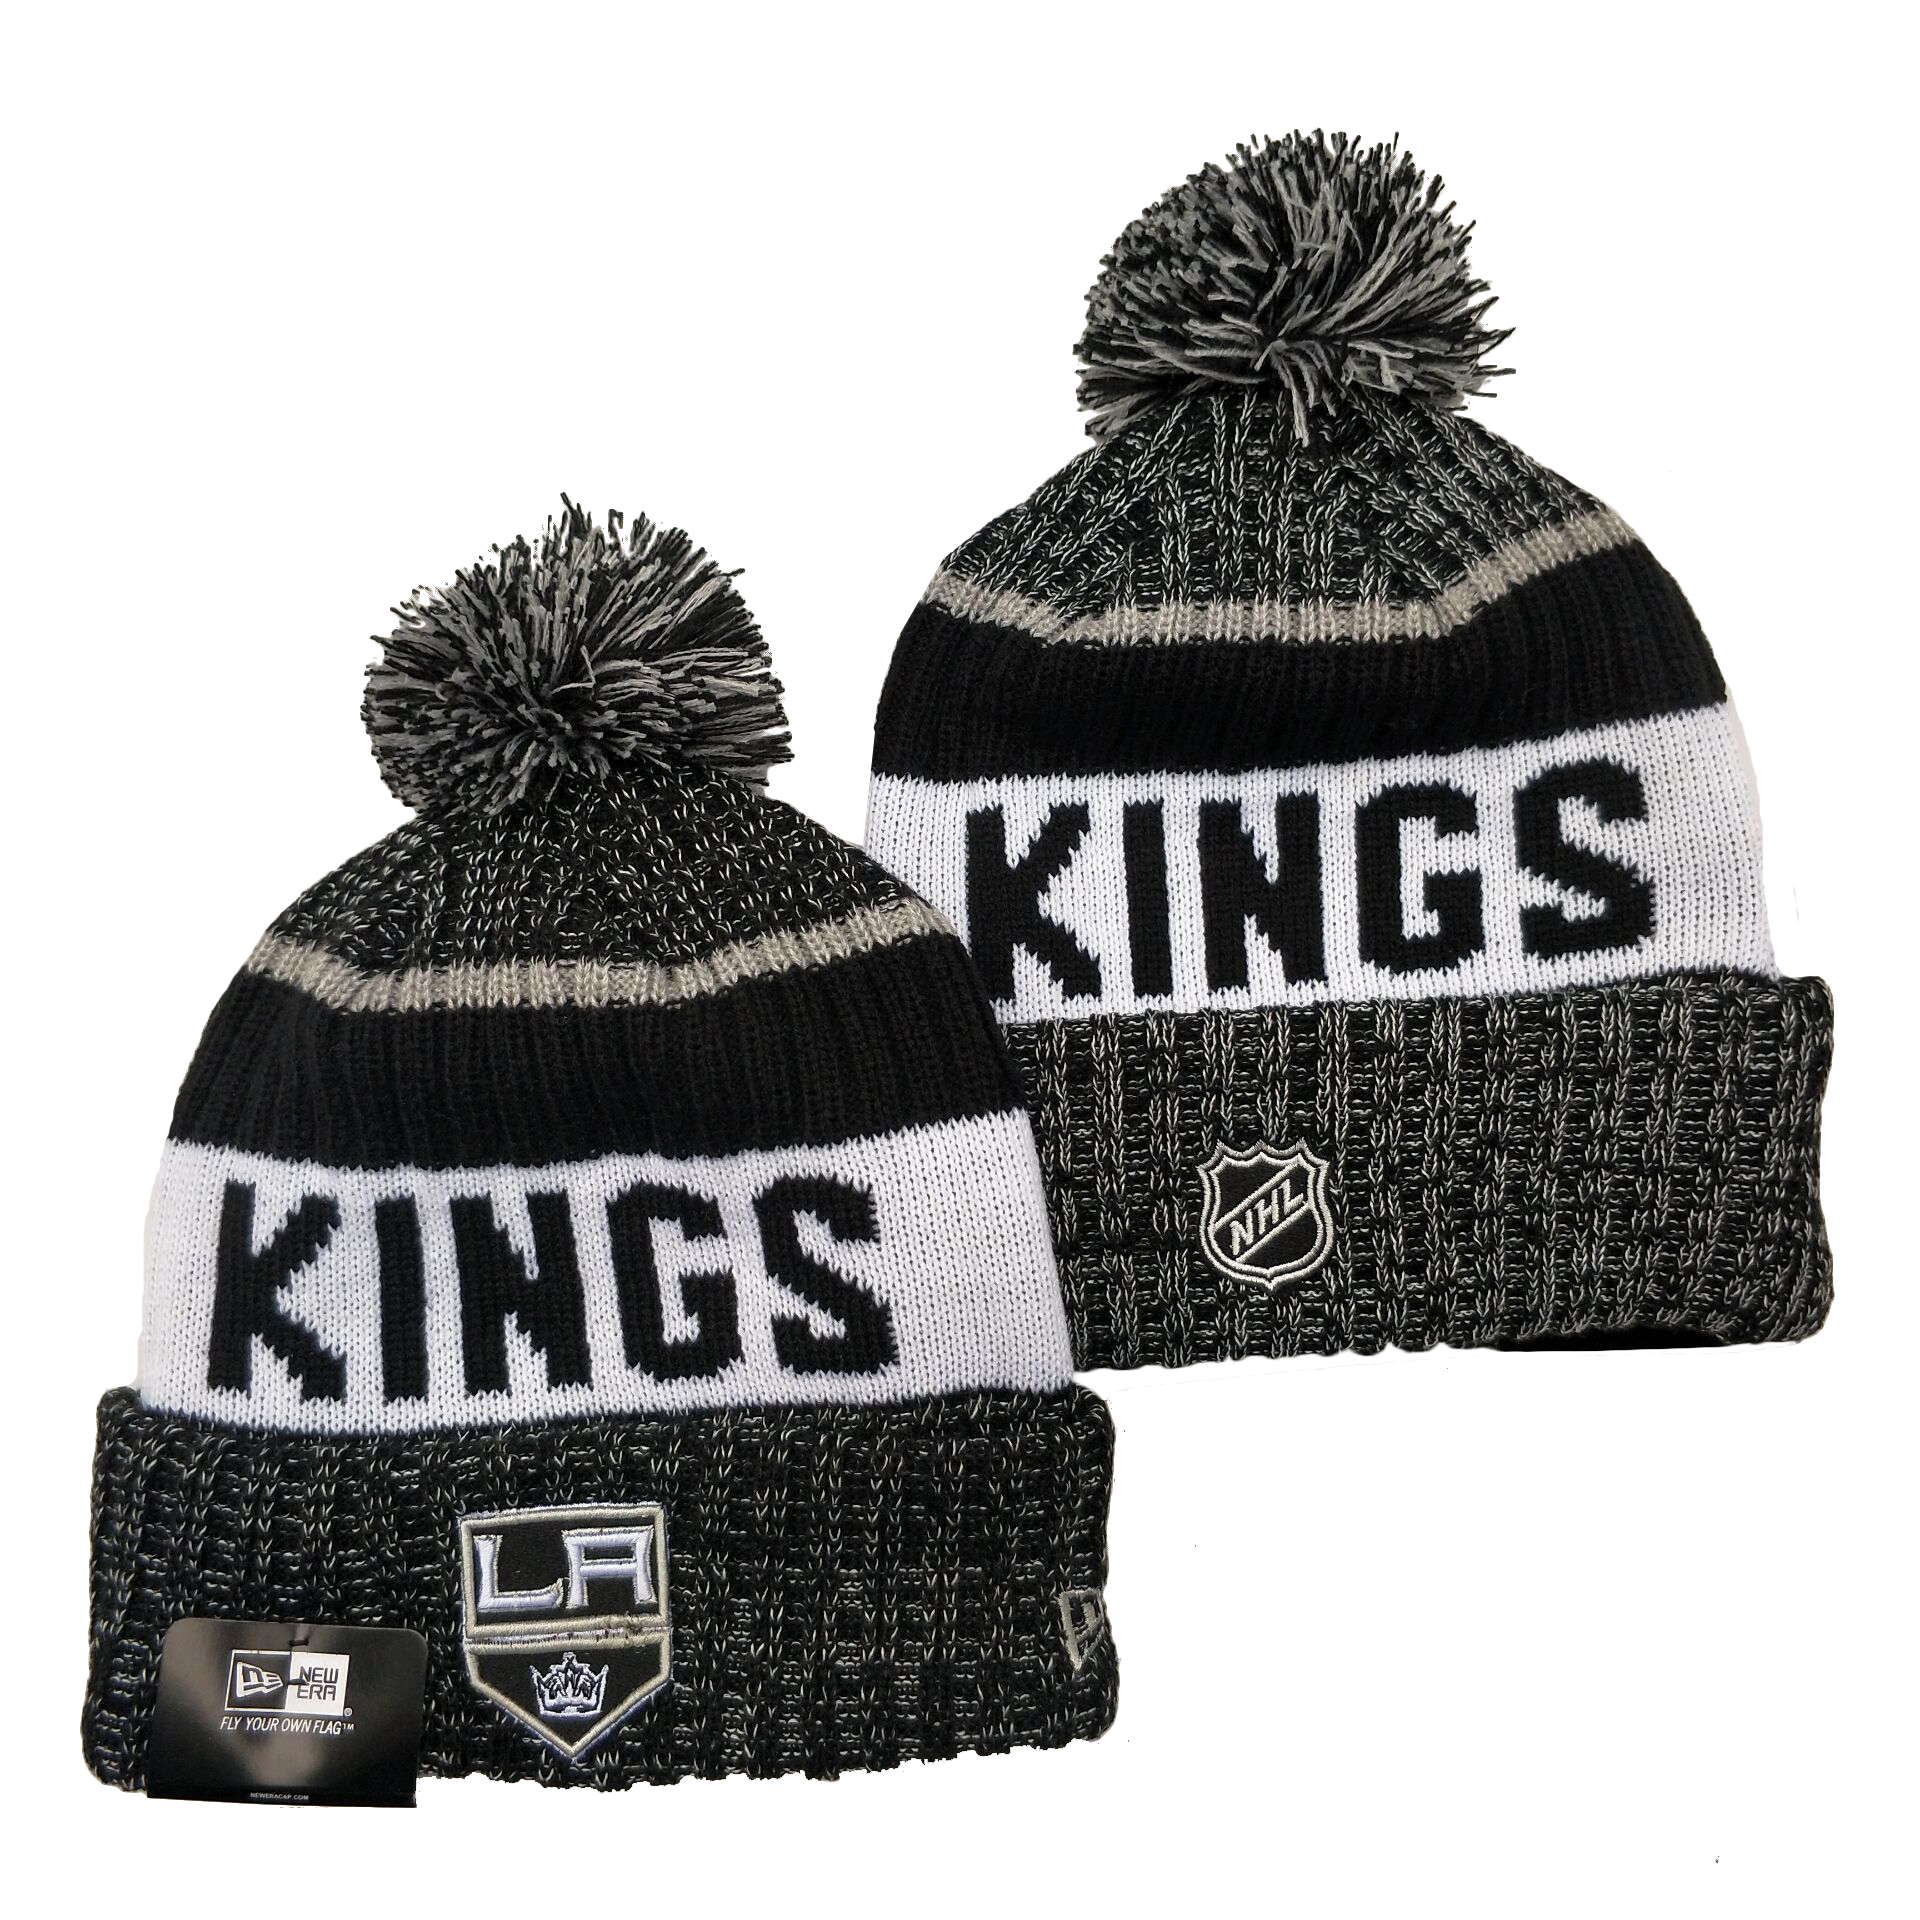 Los Angeles Kings Team Logo Black White Pom Cuffed Knit Hat YD